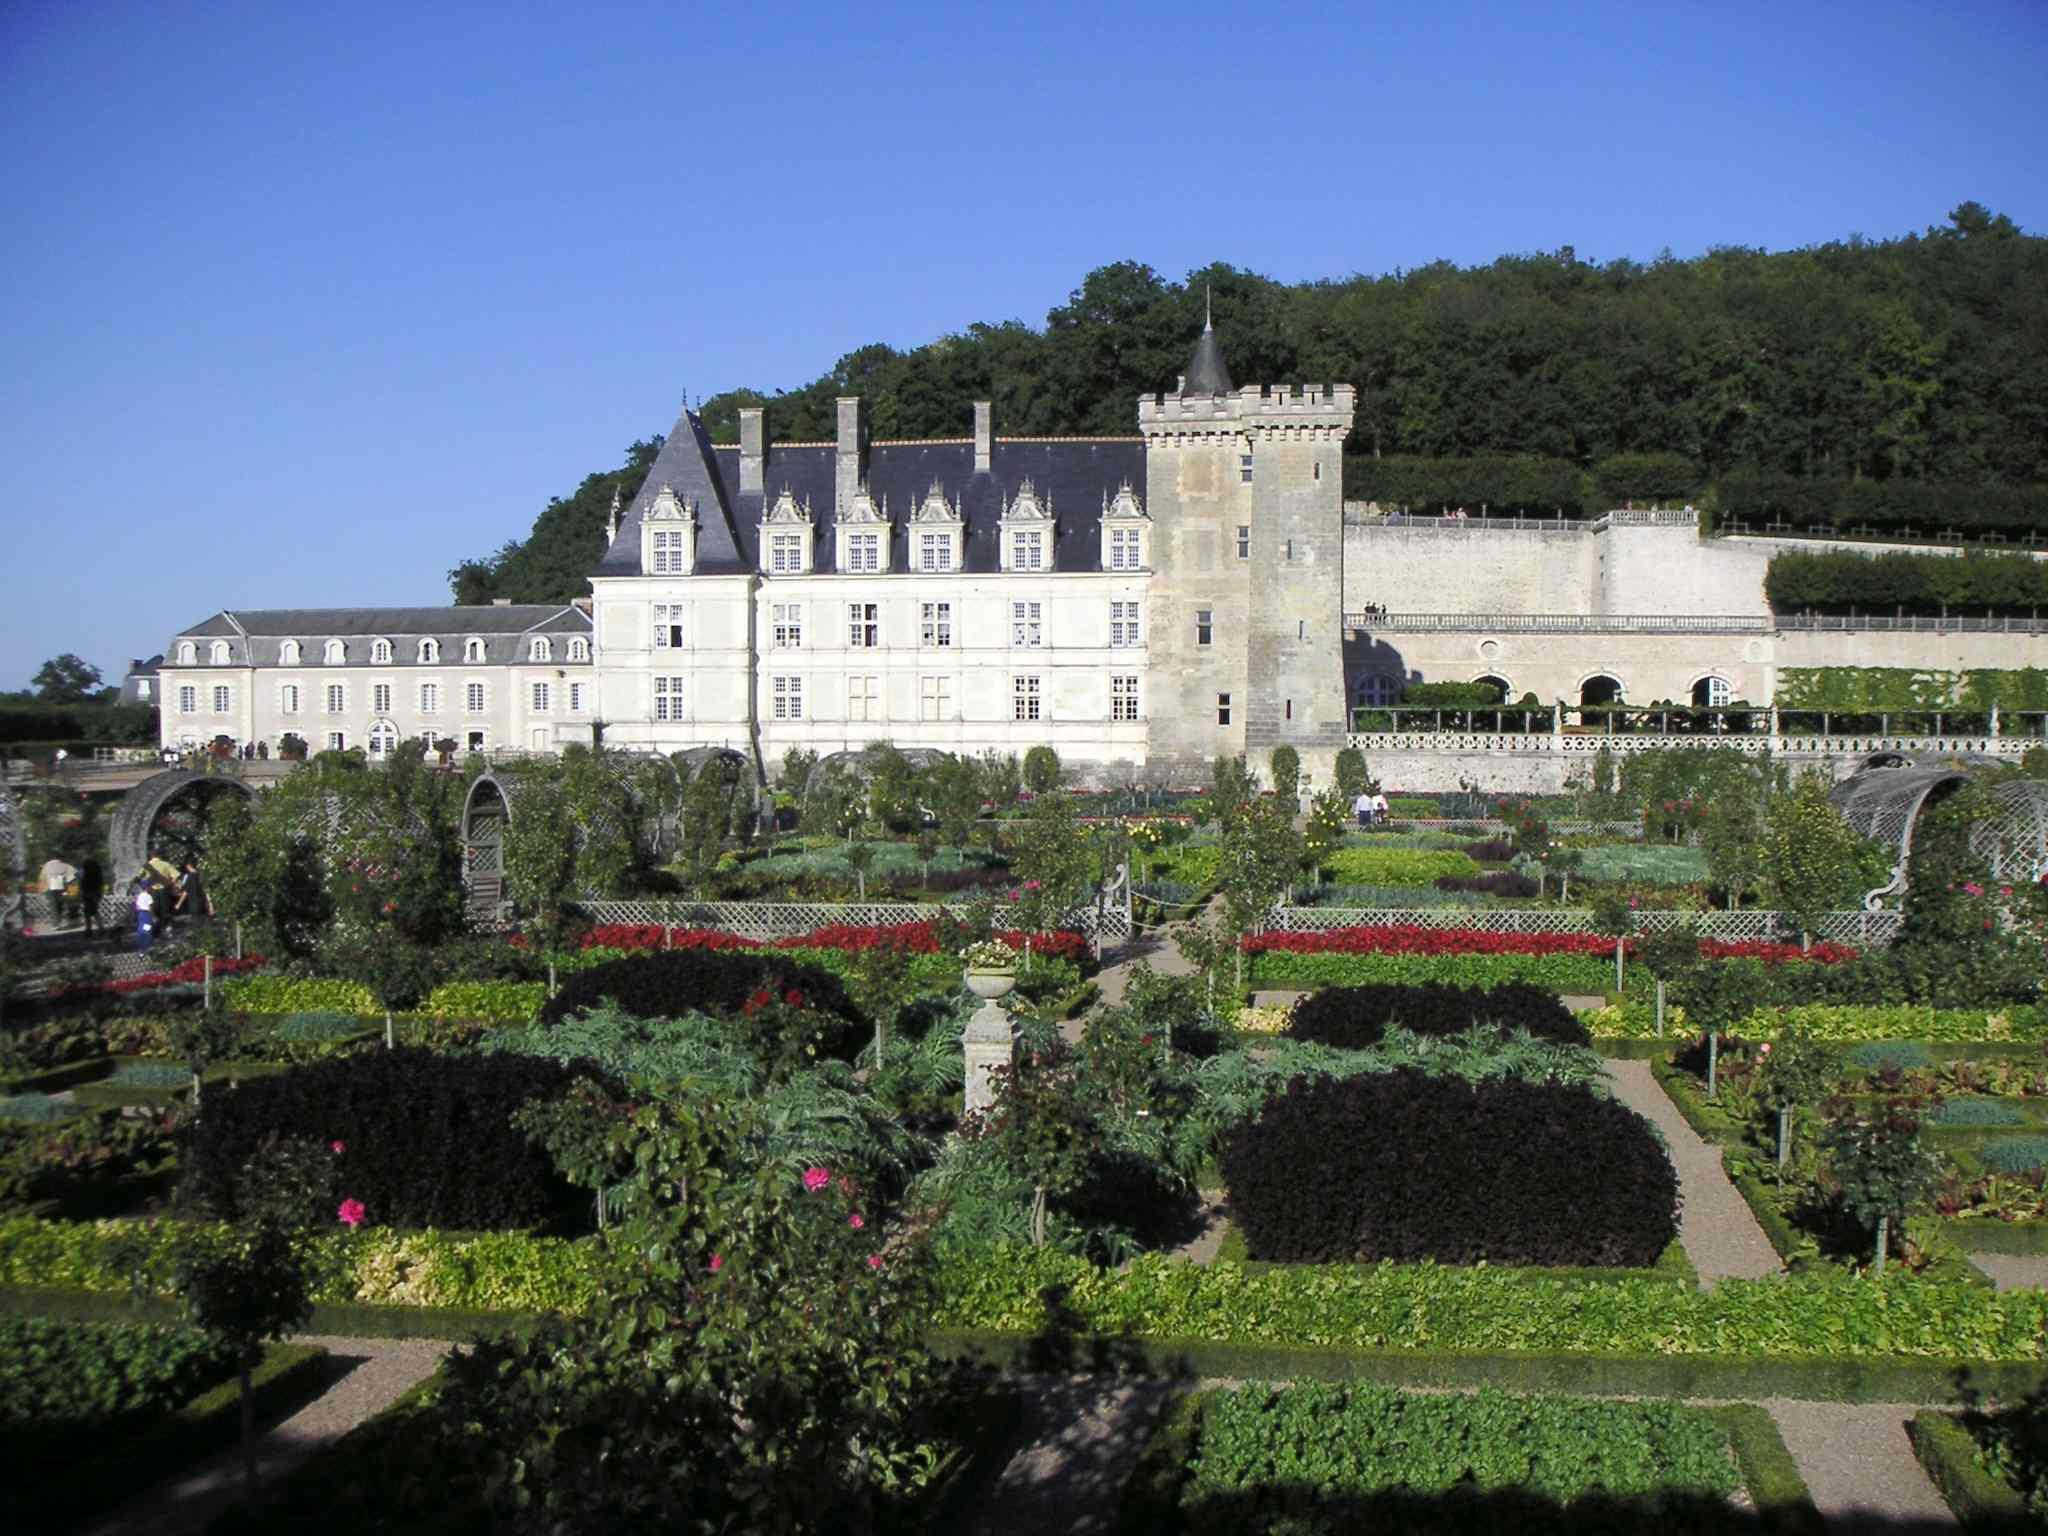 Fran a da walkyria ch teau de villandry vall e de la loire - Le manuel des jardins agroecologiques ...